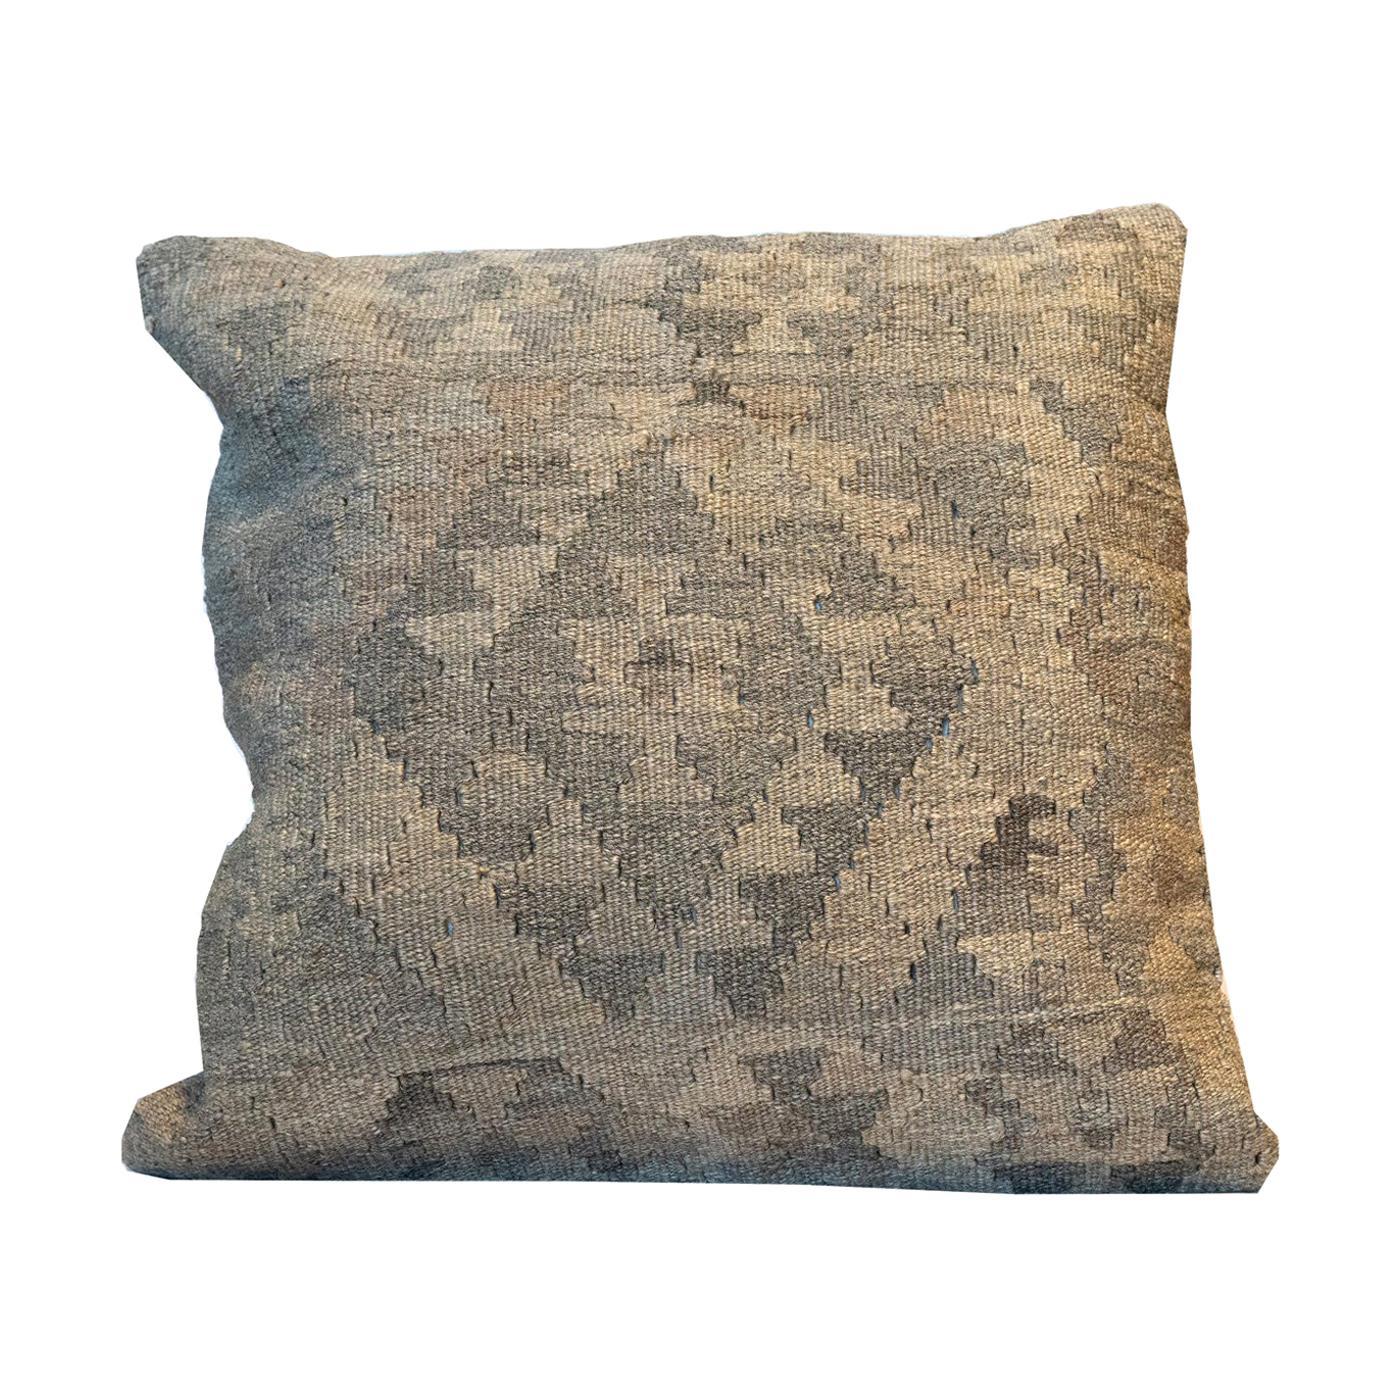 Grey Kilim Decorative Pillow Bench